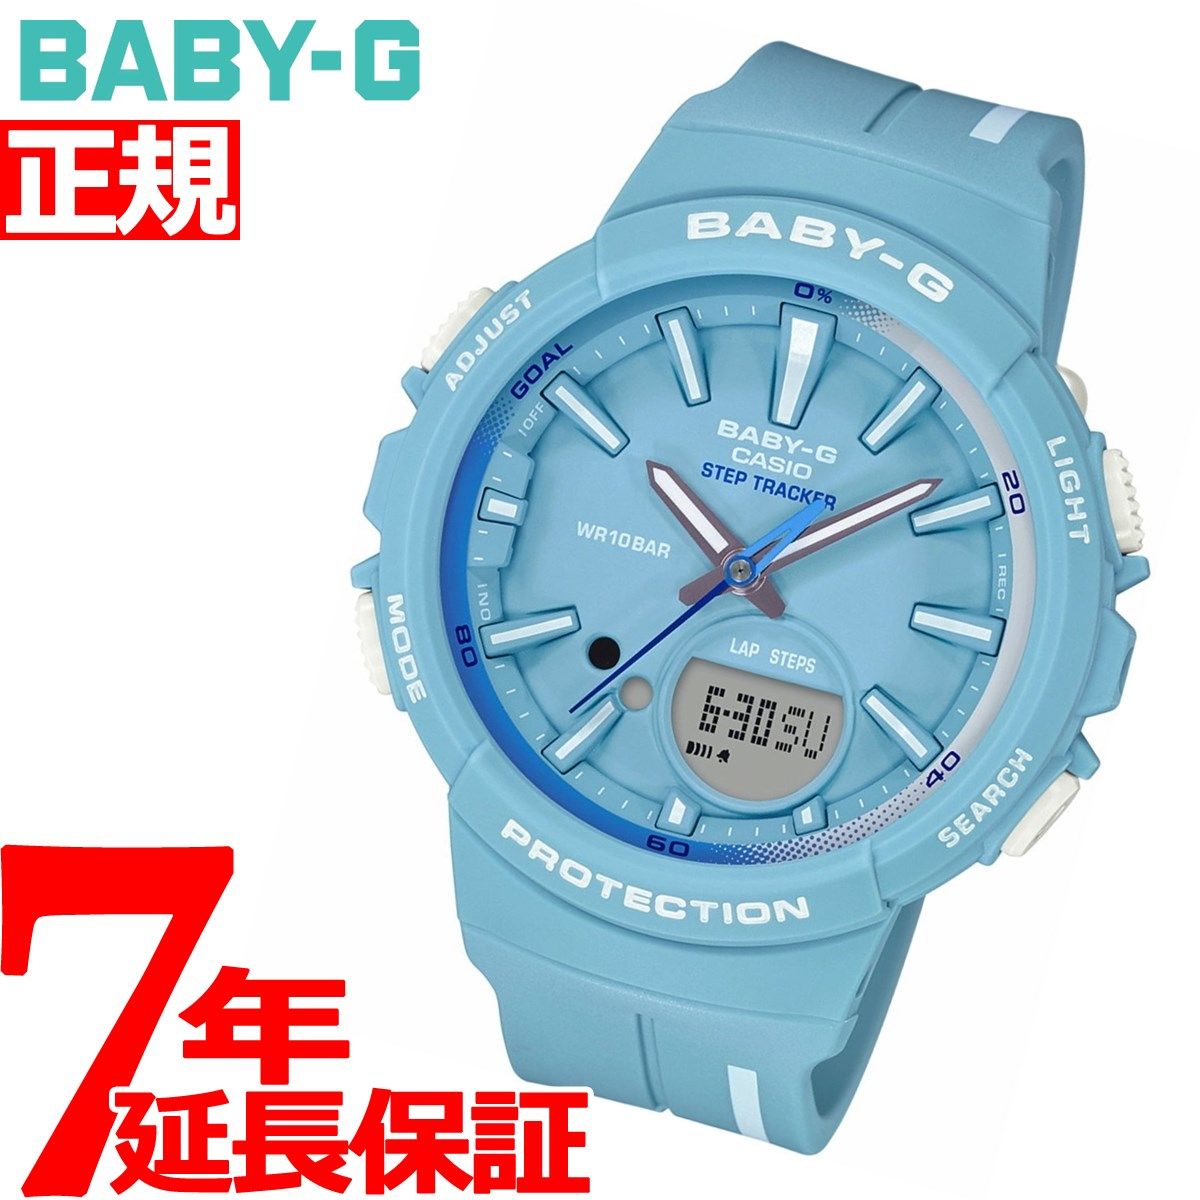 【SHOP OF THE YEAR 2018 受賞】カシオ ベビーG CASIO BABY-G BGS-100 for running STEP TRACKER 腕時計 レディース BGS-100RT-2AJF【2018 新作】